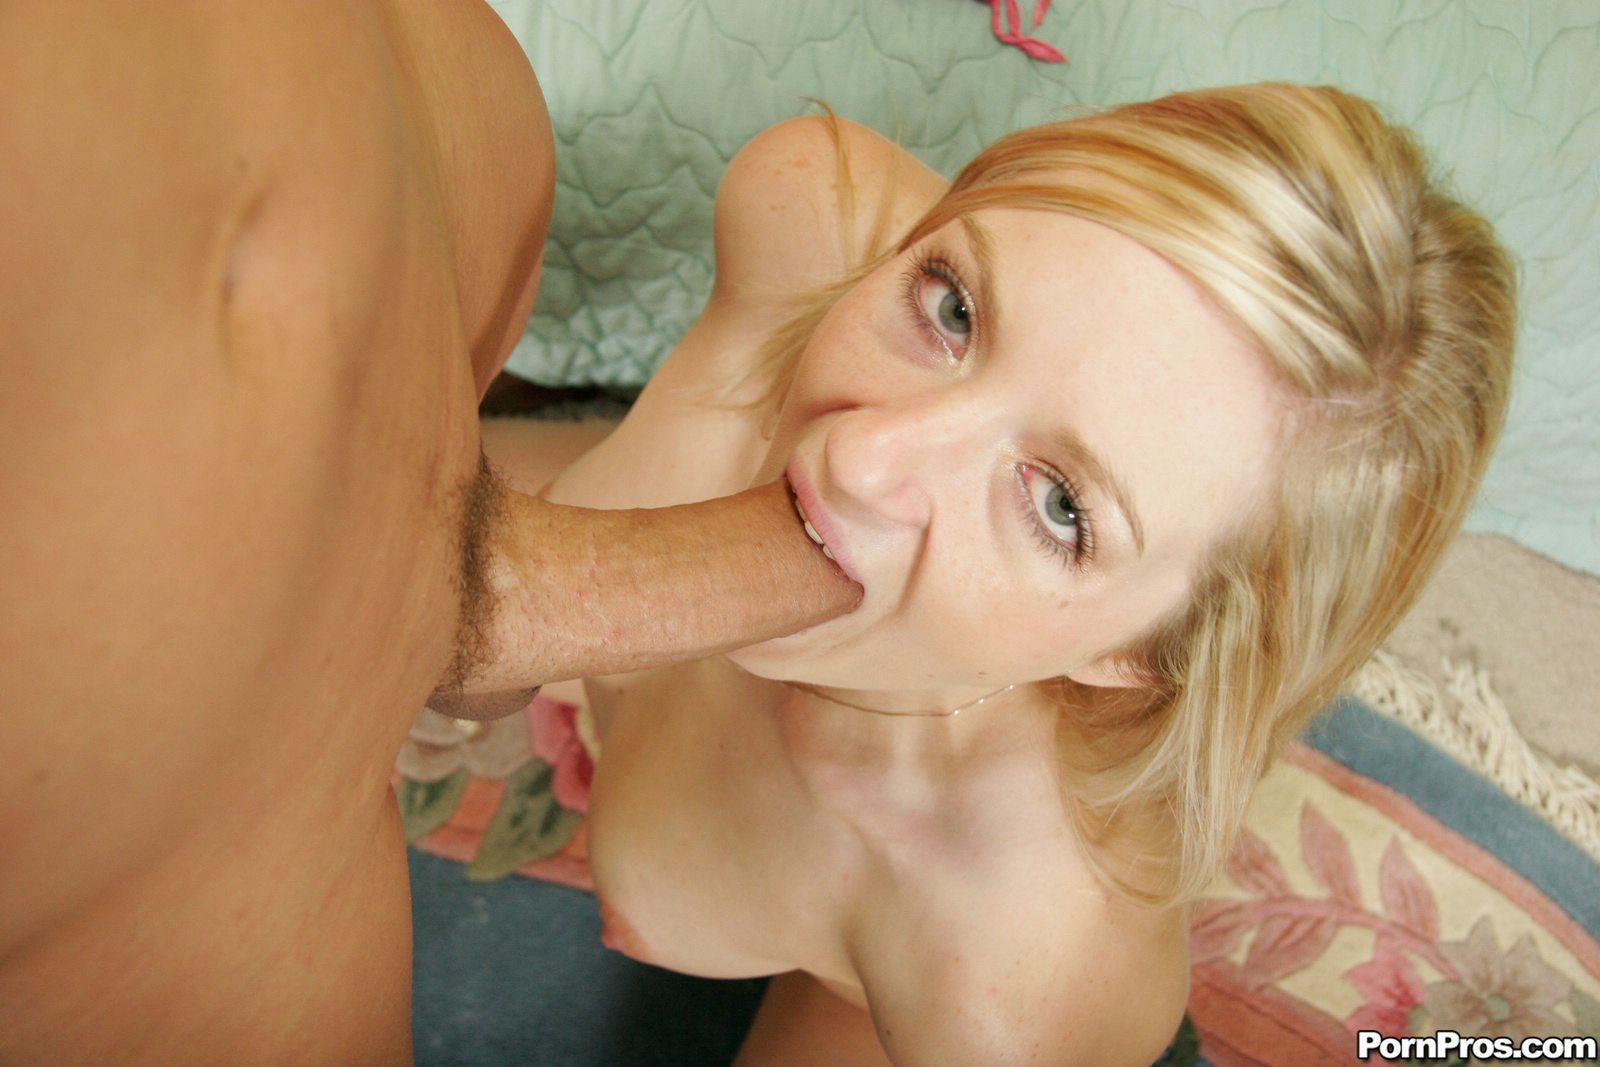 Kylee Reese Porn Star